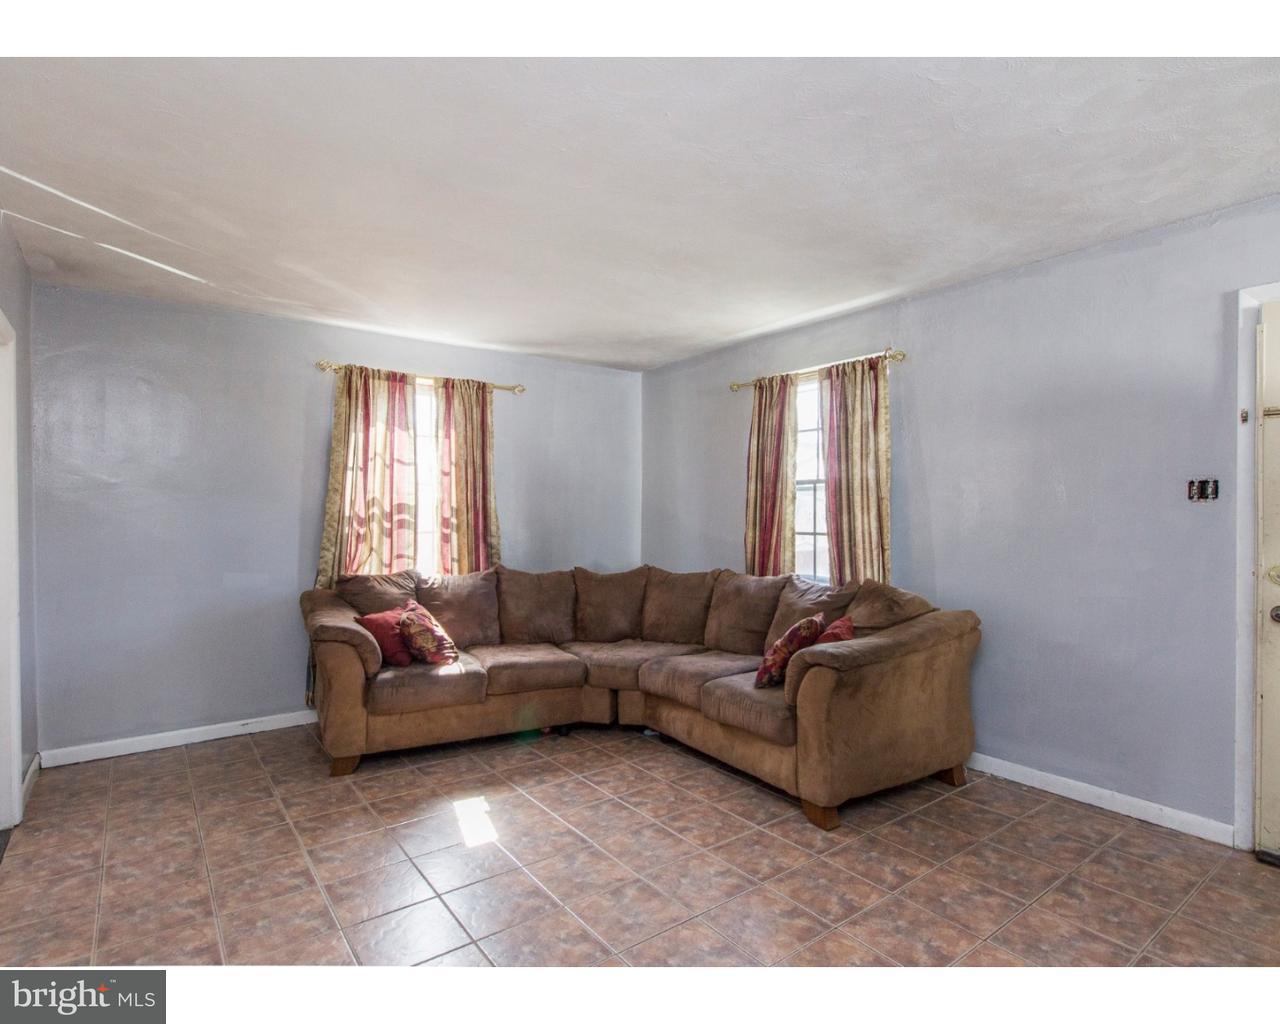 117 E BURTON LN E, SHARON HILL - Listed at $1,400, SHARON HILL